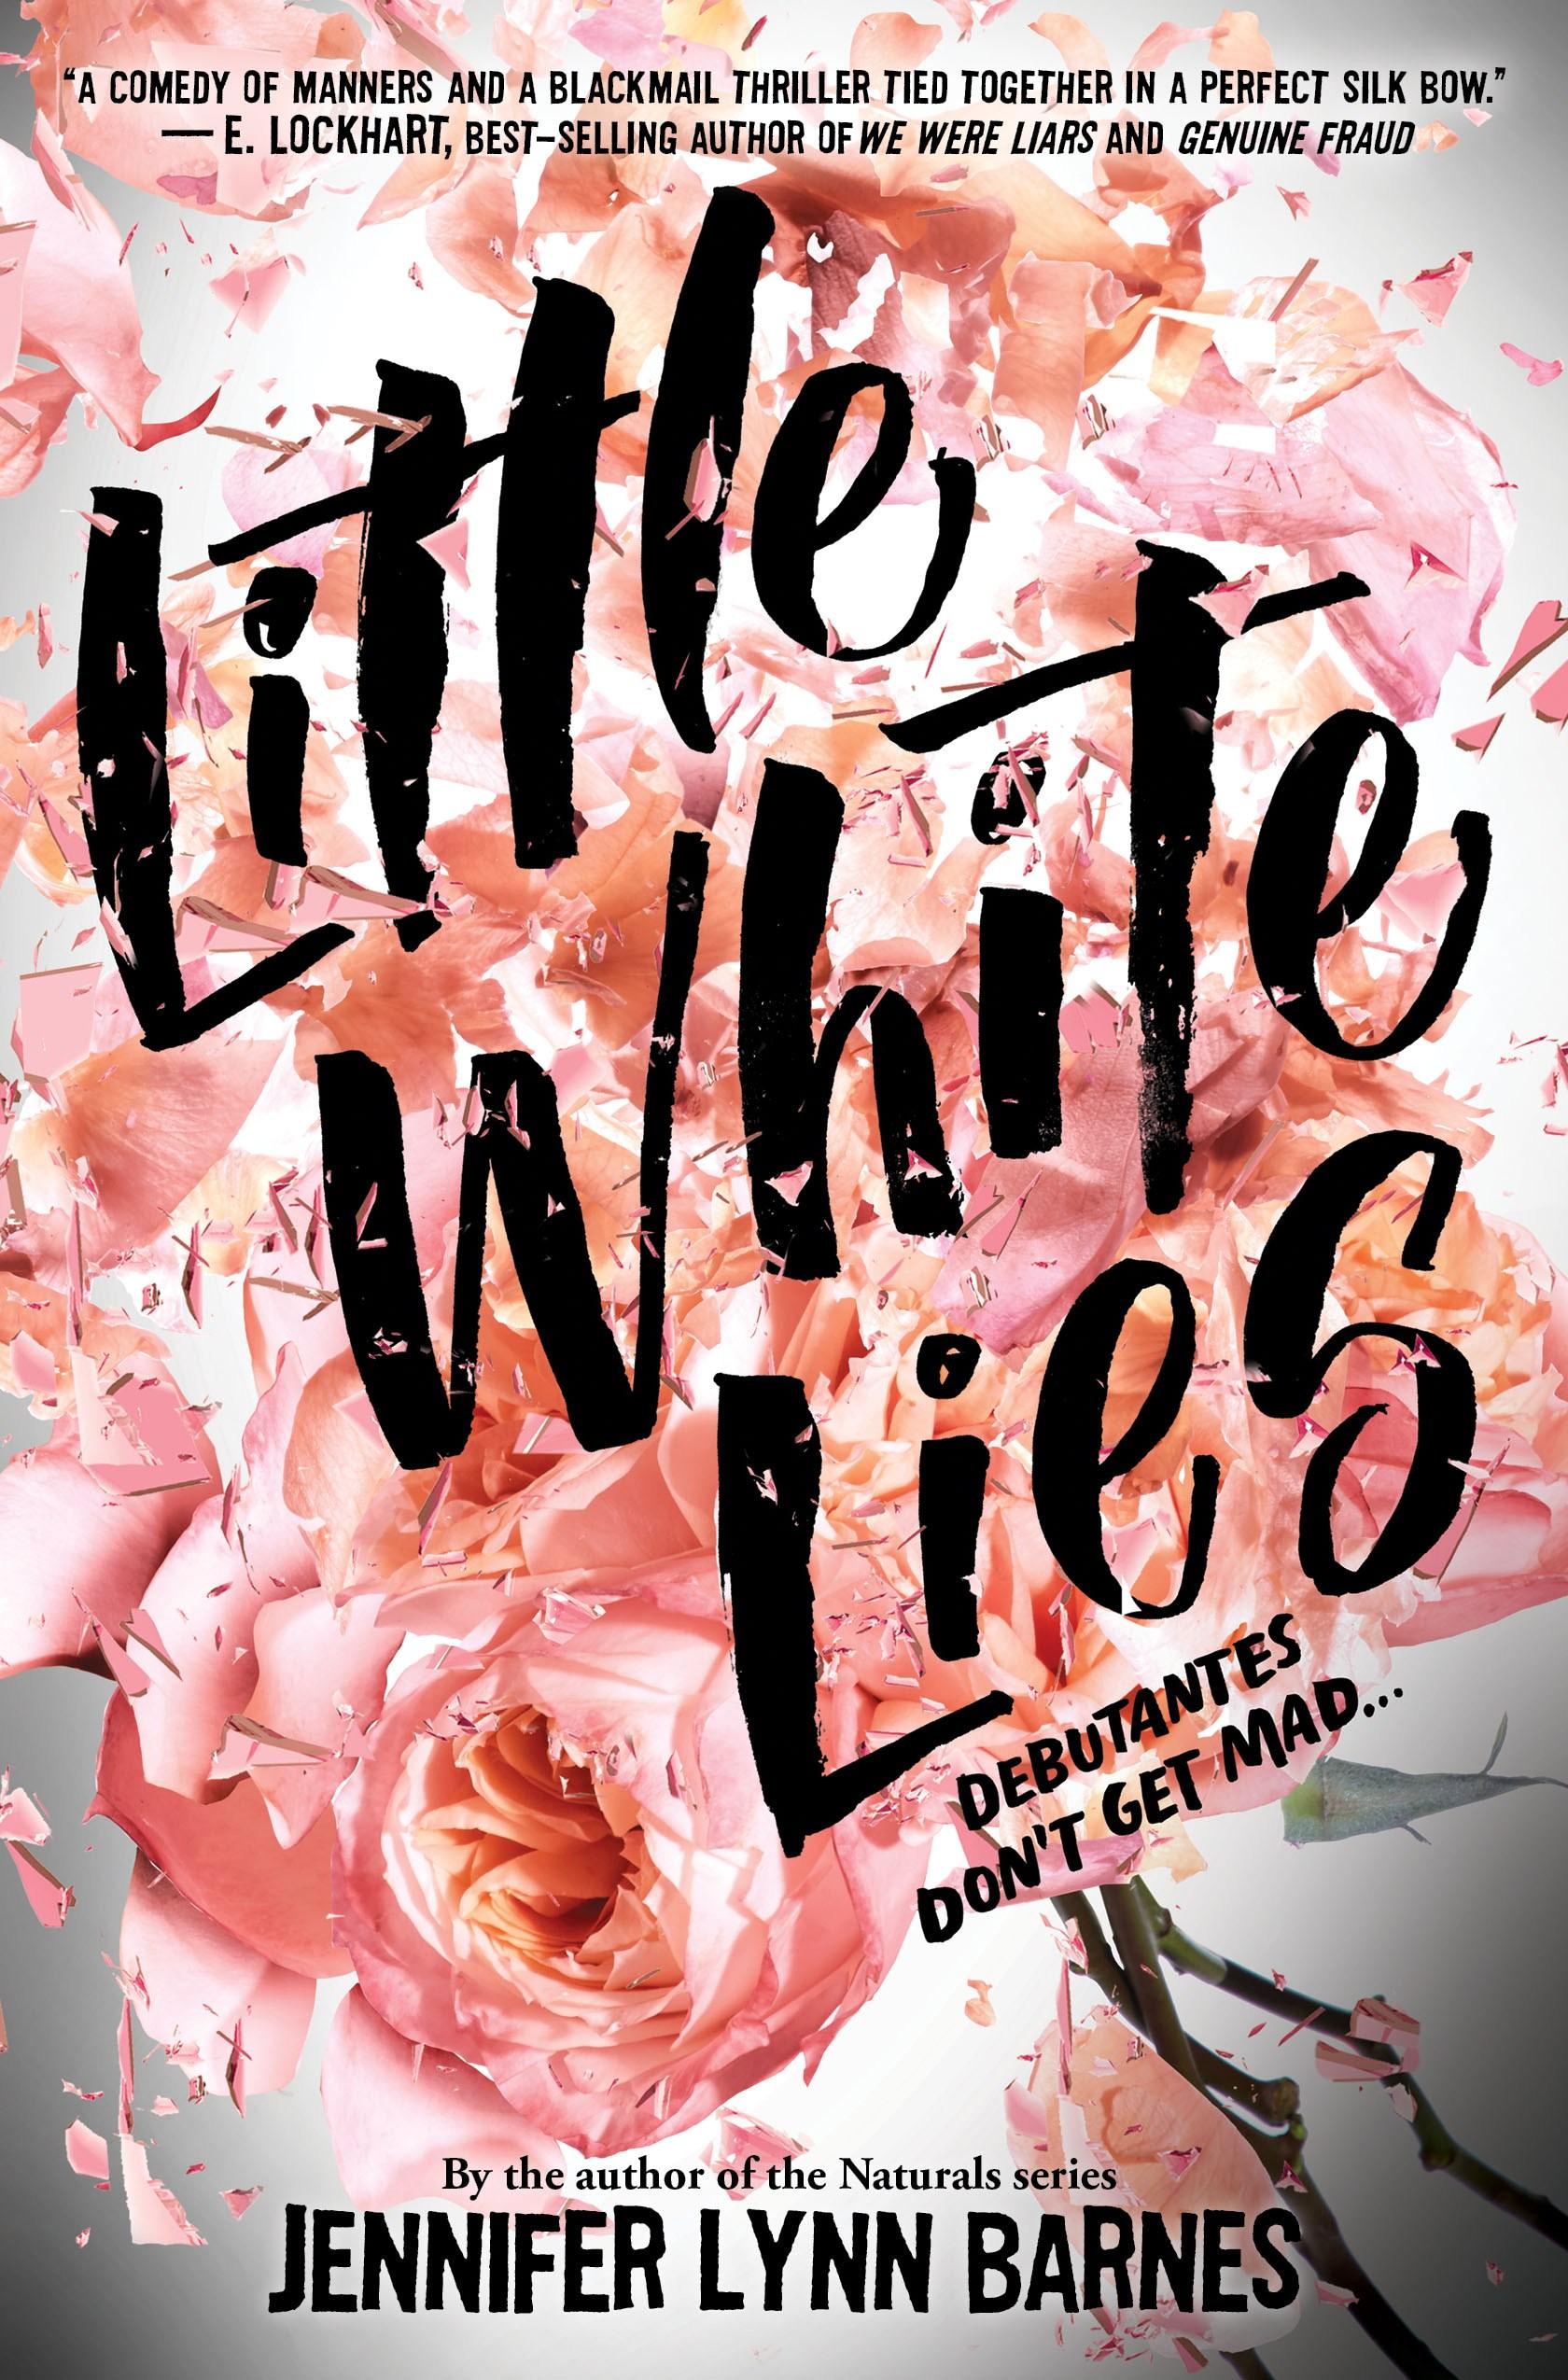 barnes-little-white-lies.jpg